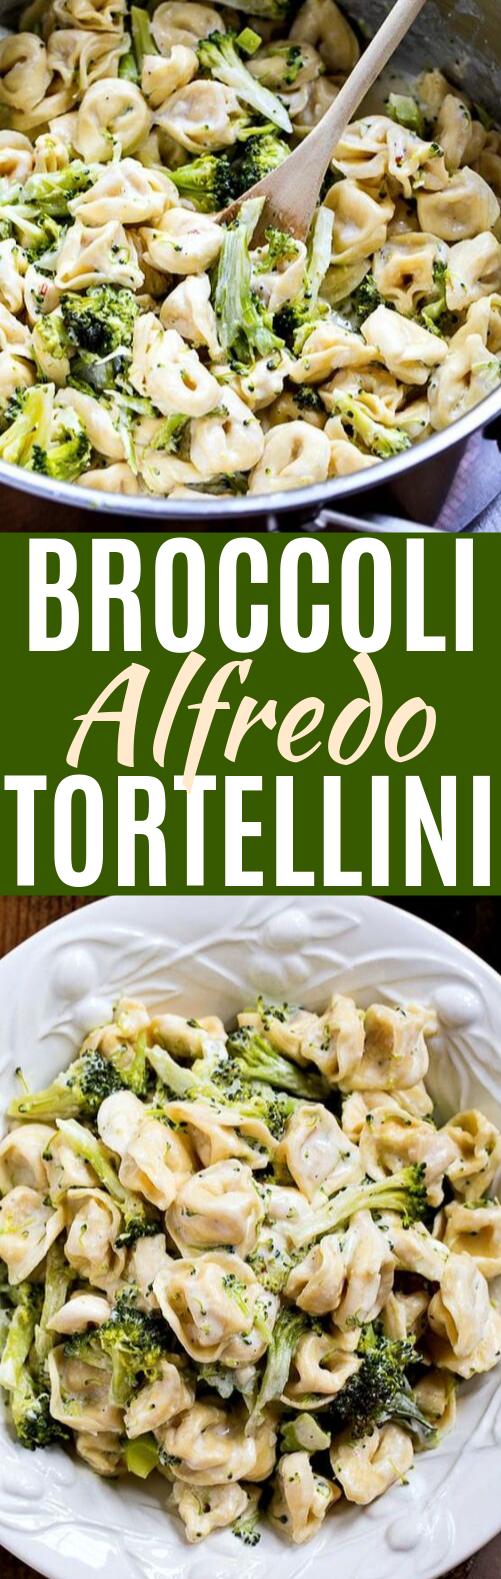 Broccoli Alfredo Tortellini #vegetarian #pasta